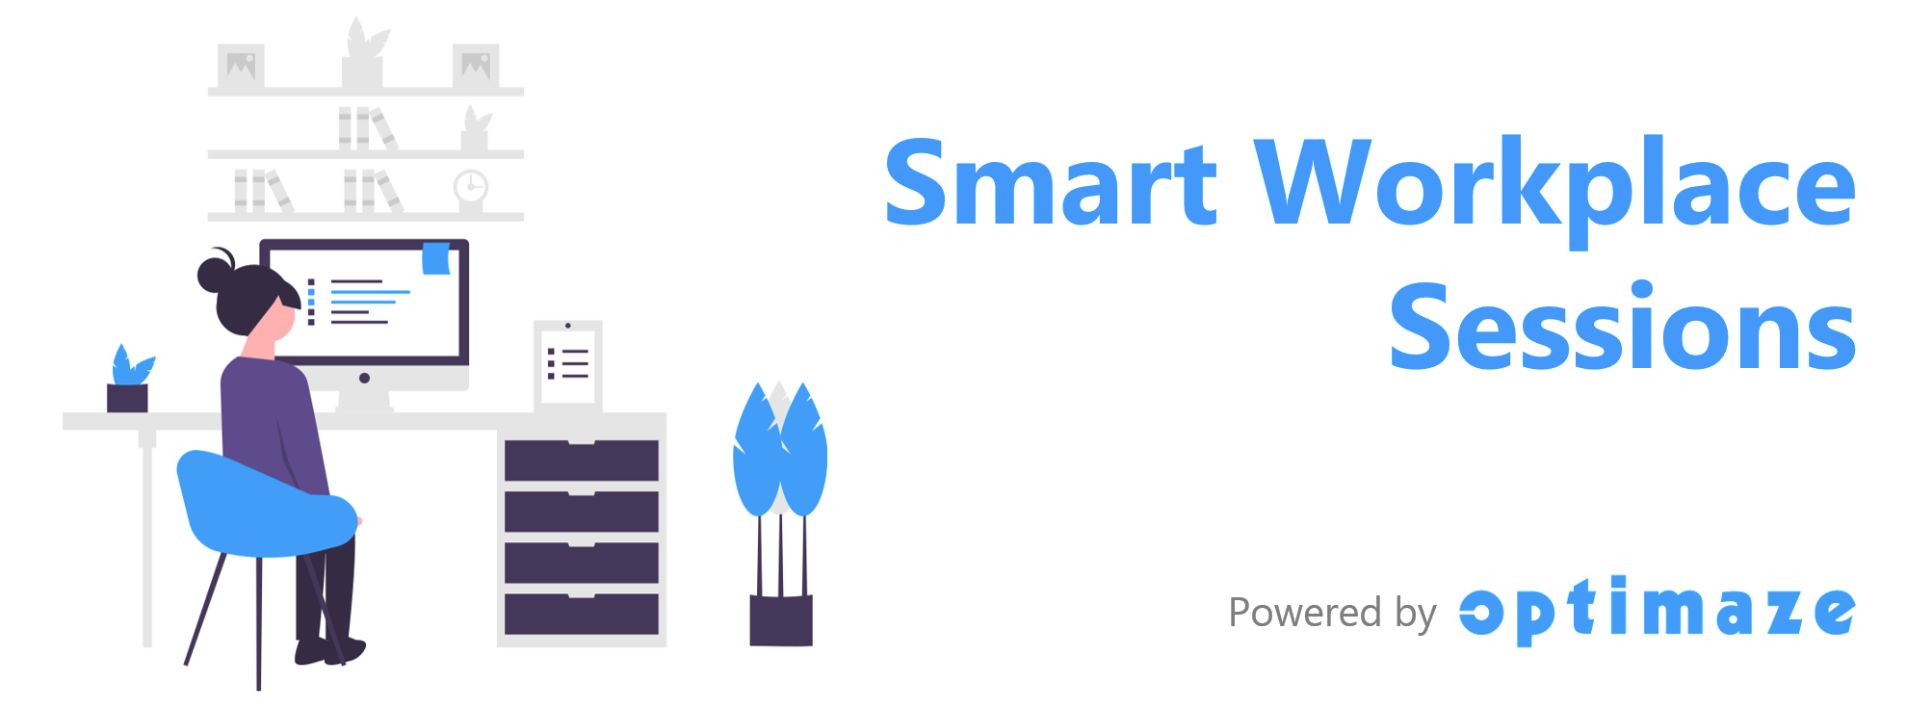 Optimaze-Smart-Workplace-office-WatchWebcast_web1